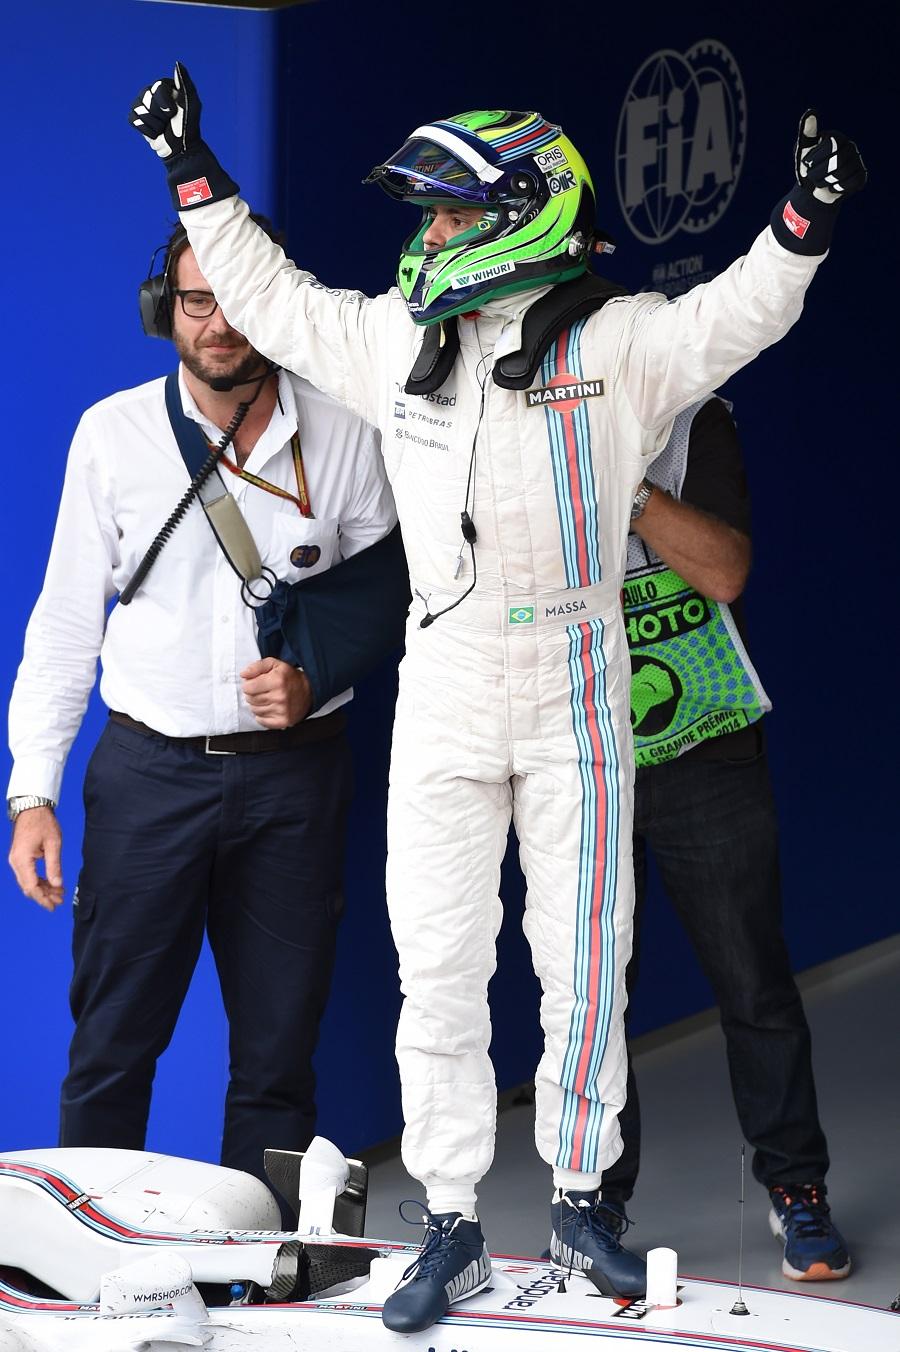 Brazilian Felipe Massa celebrates third place